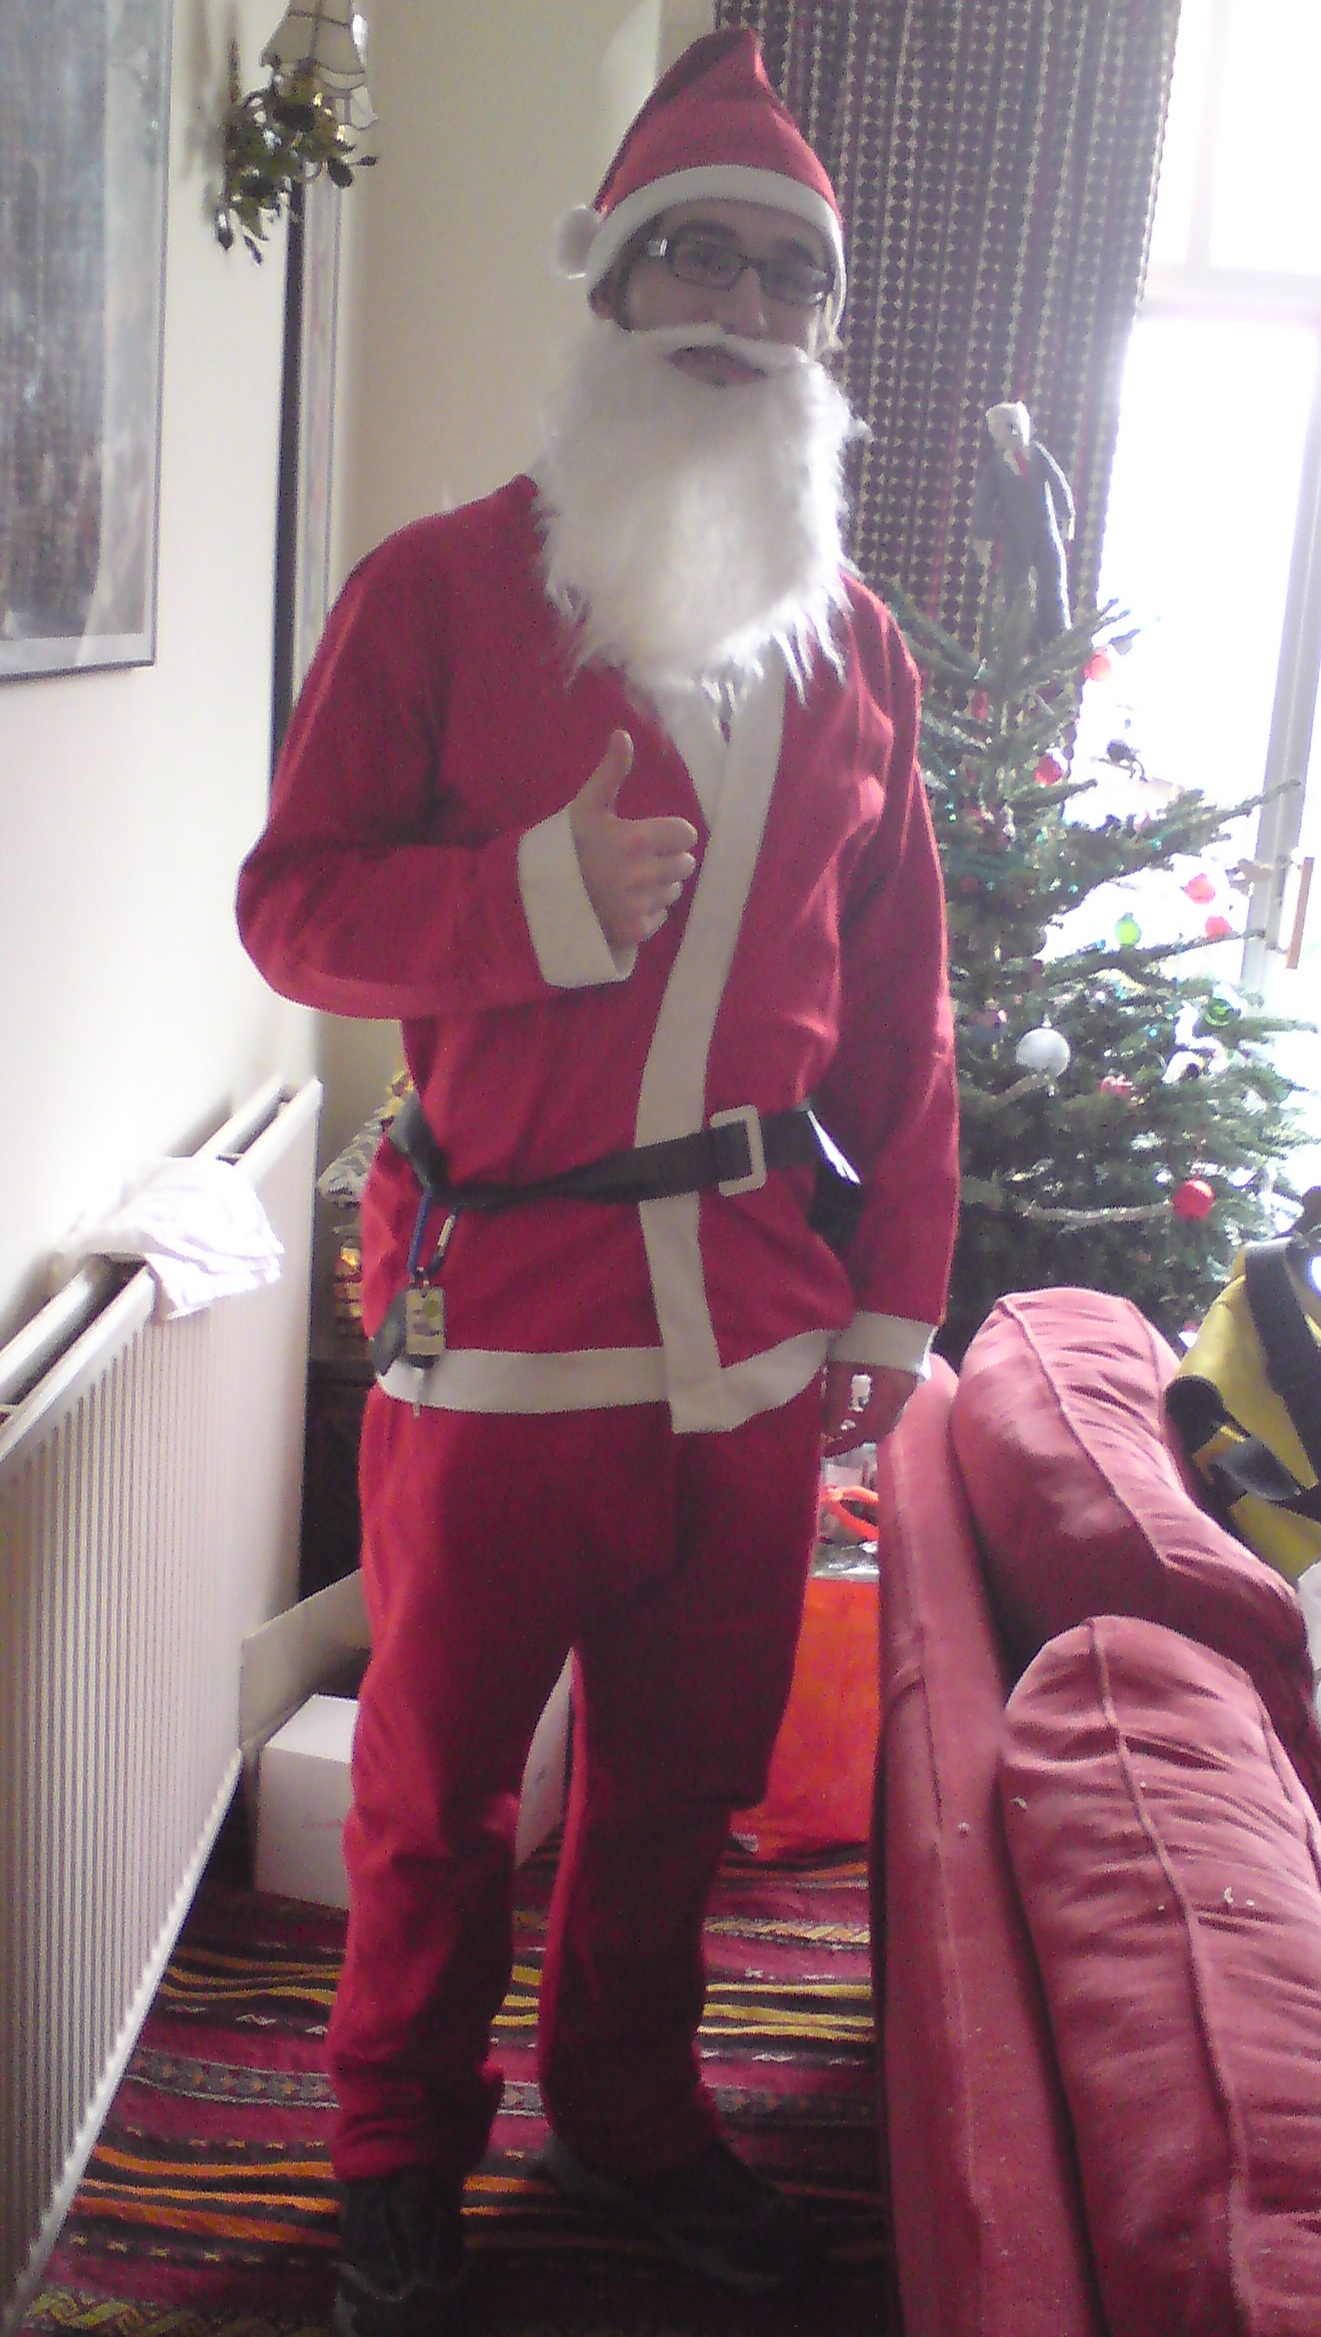 Santa the Sound Man